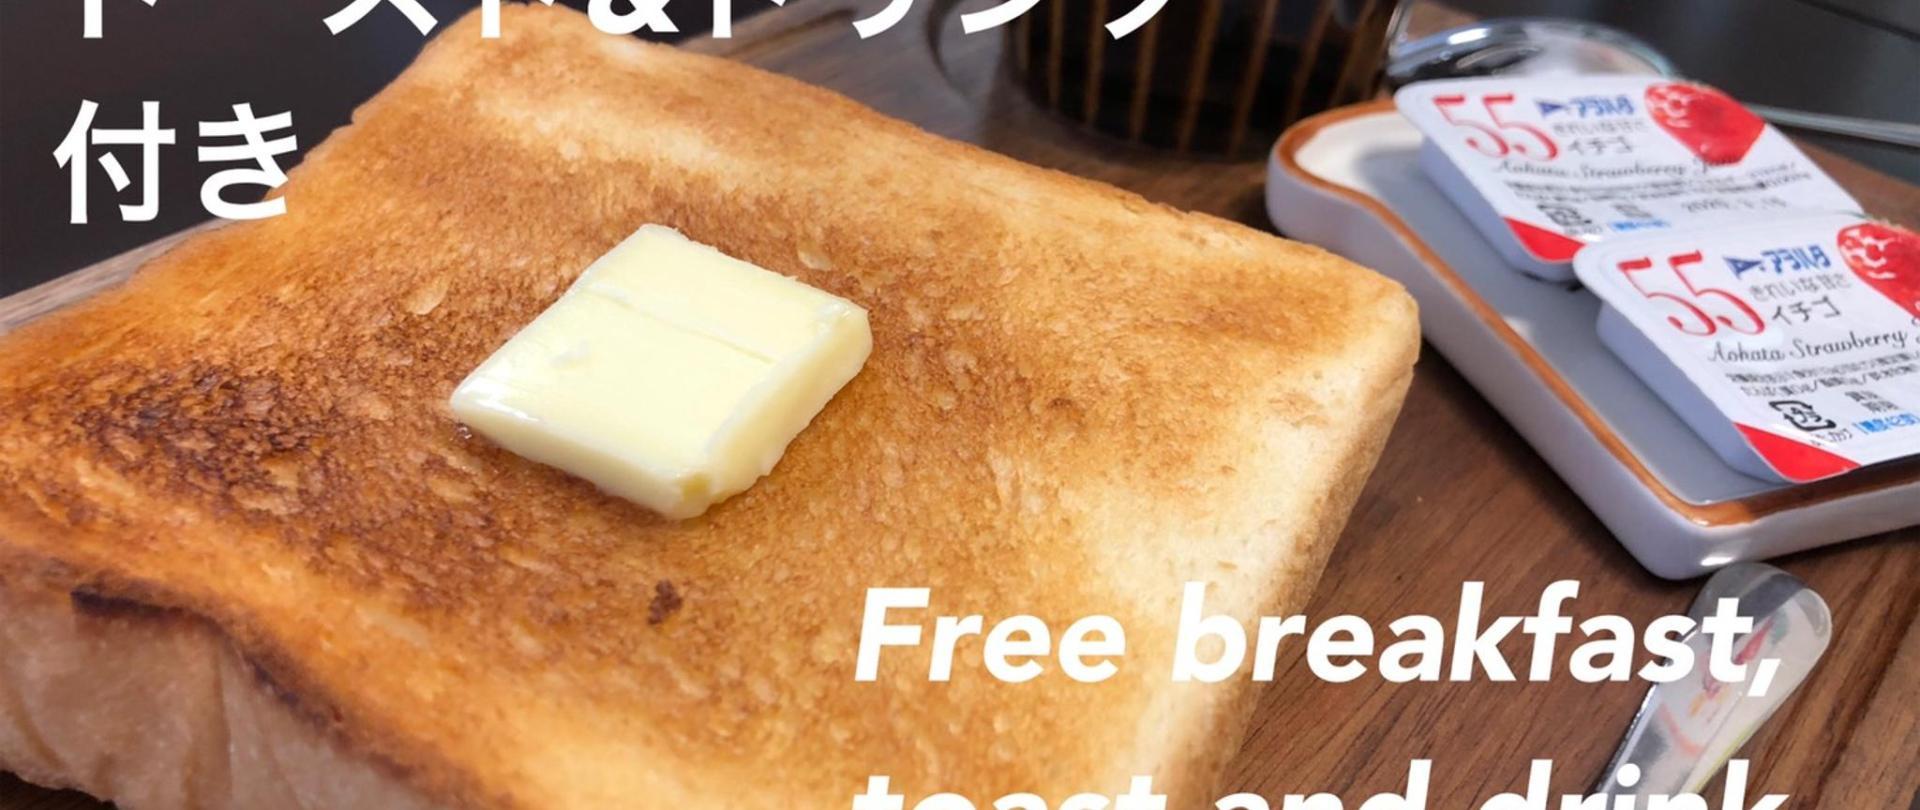 【宮崎】 朝食 ネット用写真 1.jpg